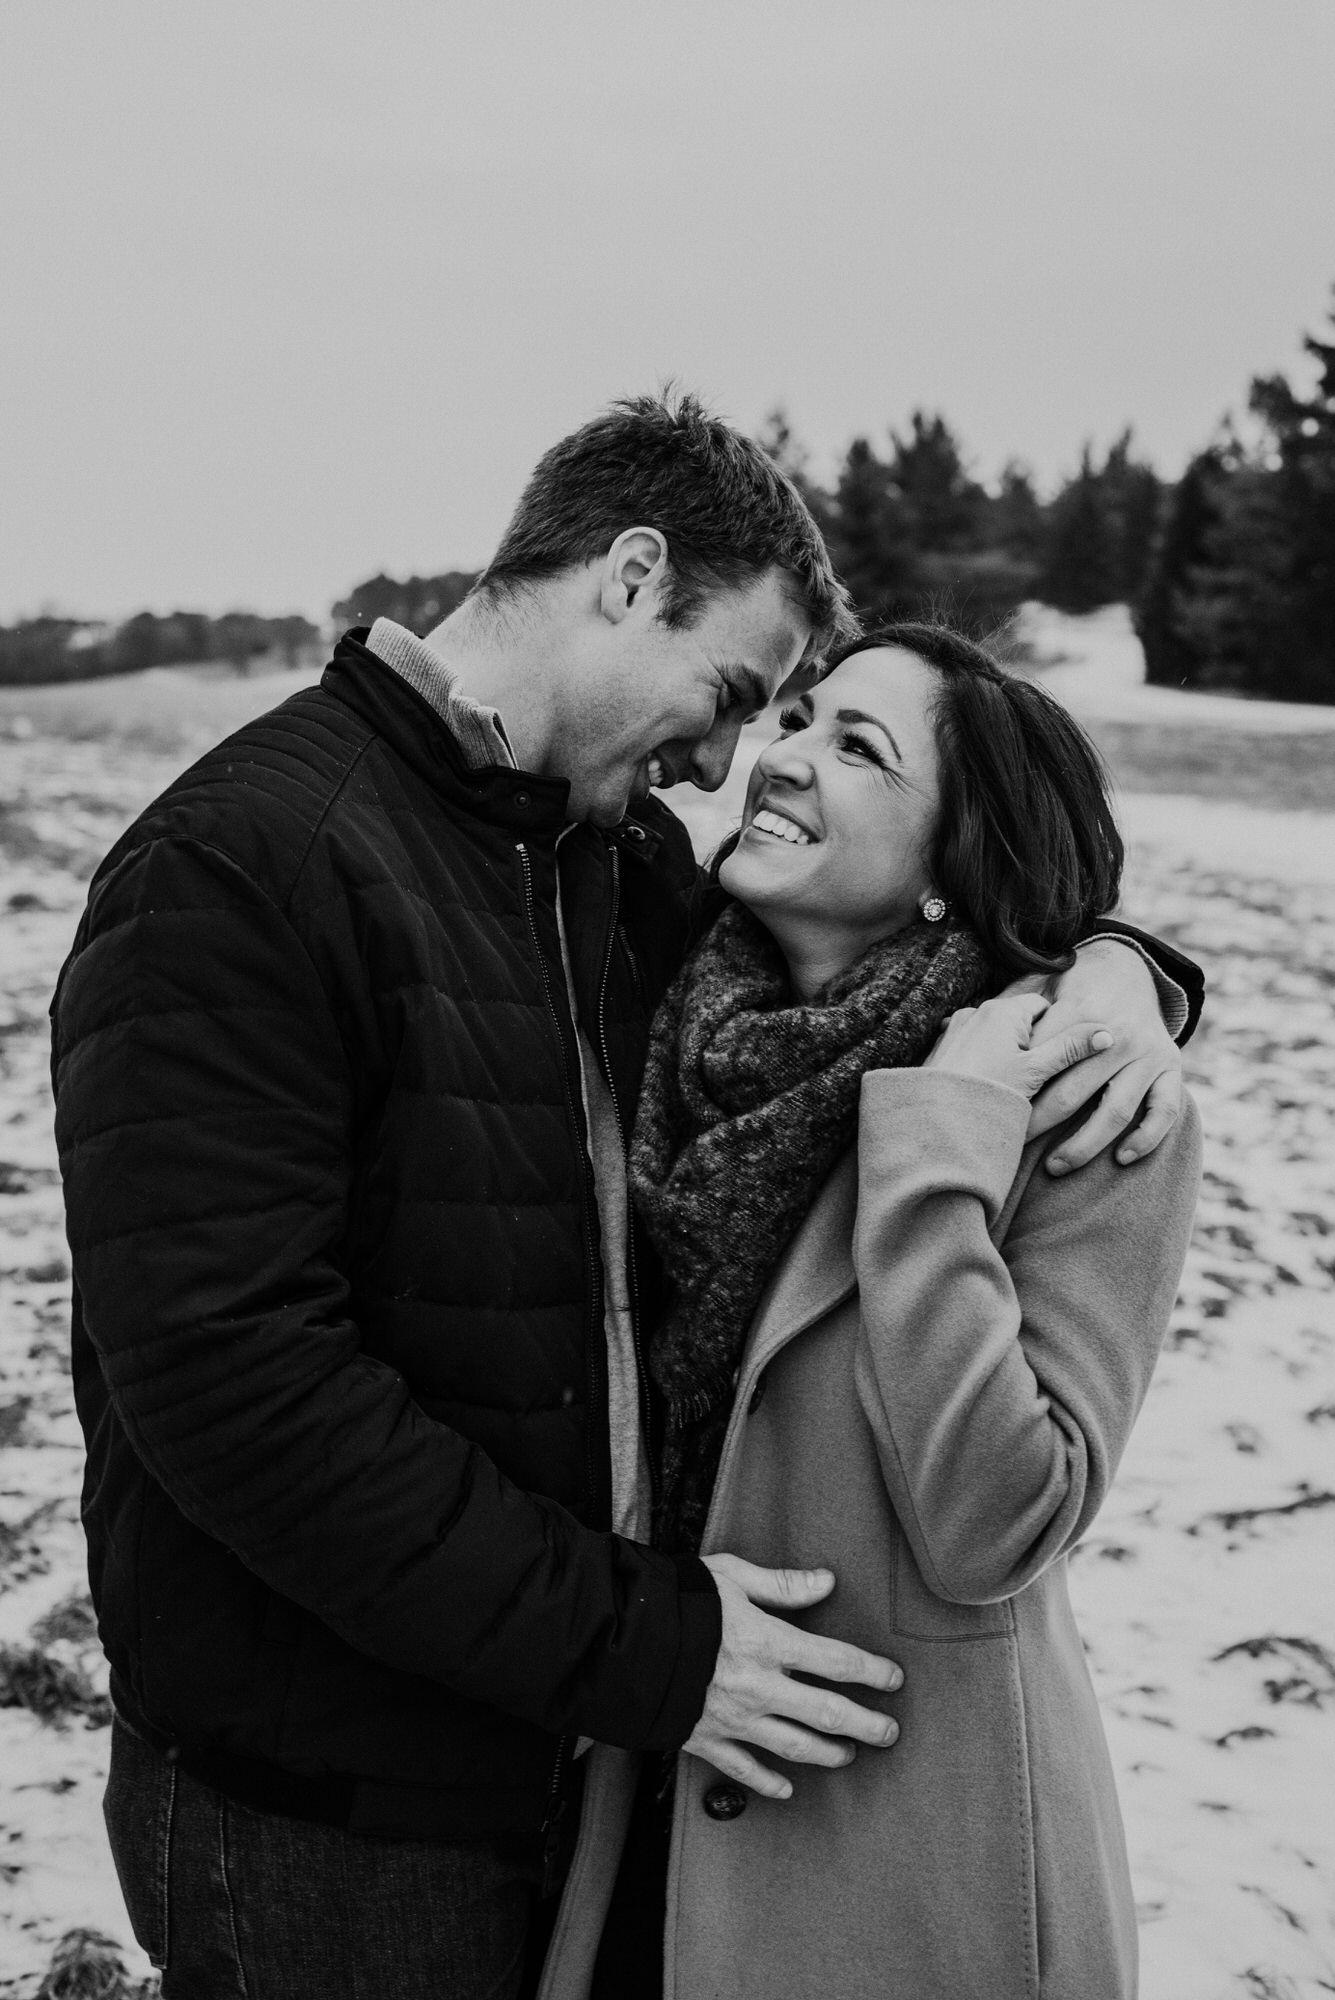 Lincoln-Columbus-Nebraska-Winter-Engagement-Kaylie-Sirek-Photography-18.jpg